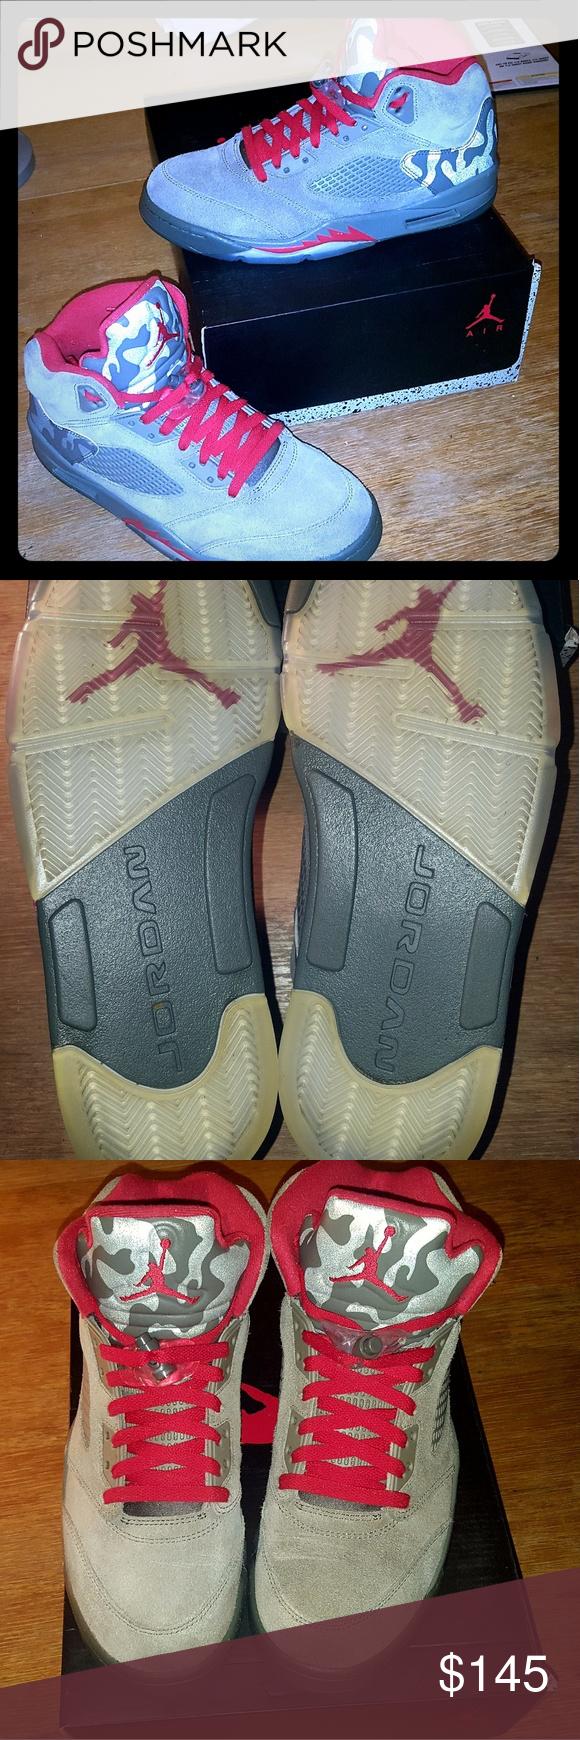 newest e472f bec84 Jordan Shoes   Nike Air Jordan Retro 5 P51 Camo Sz. 10.5 ...